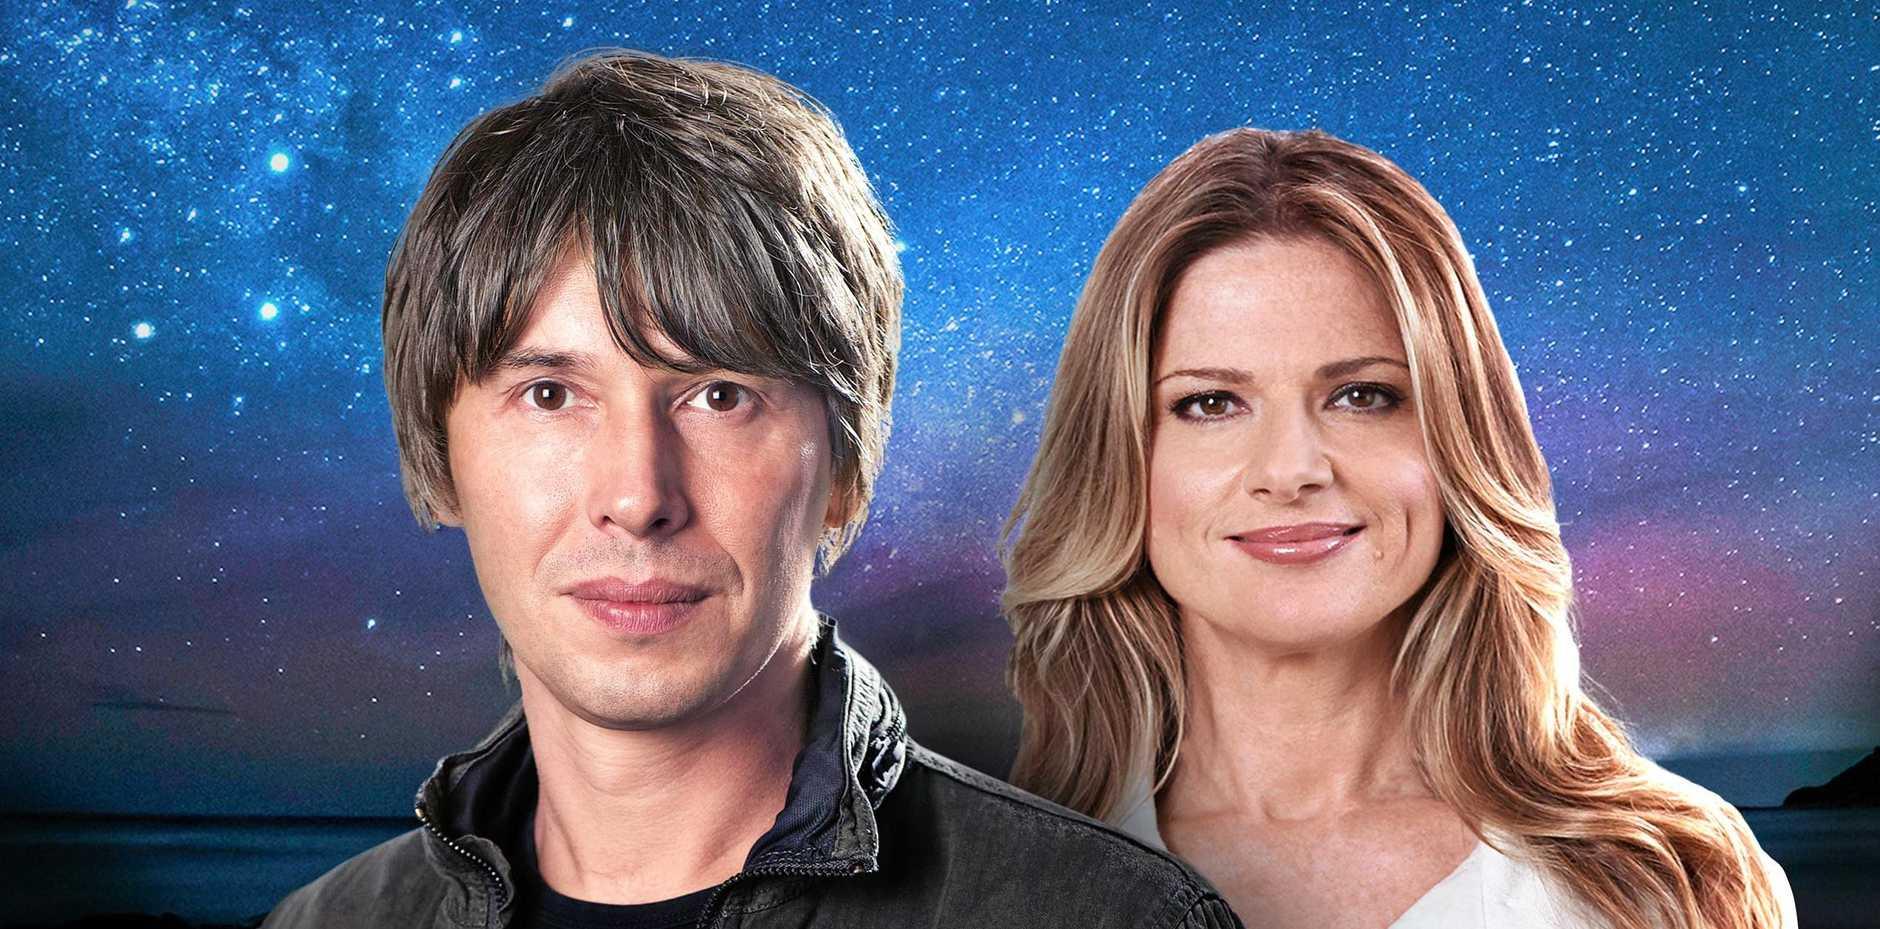 Professor Brian Cox and Julia Zemiro return to host a second year of Stargazing Live.